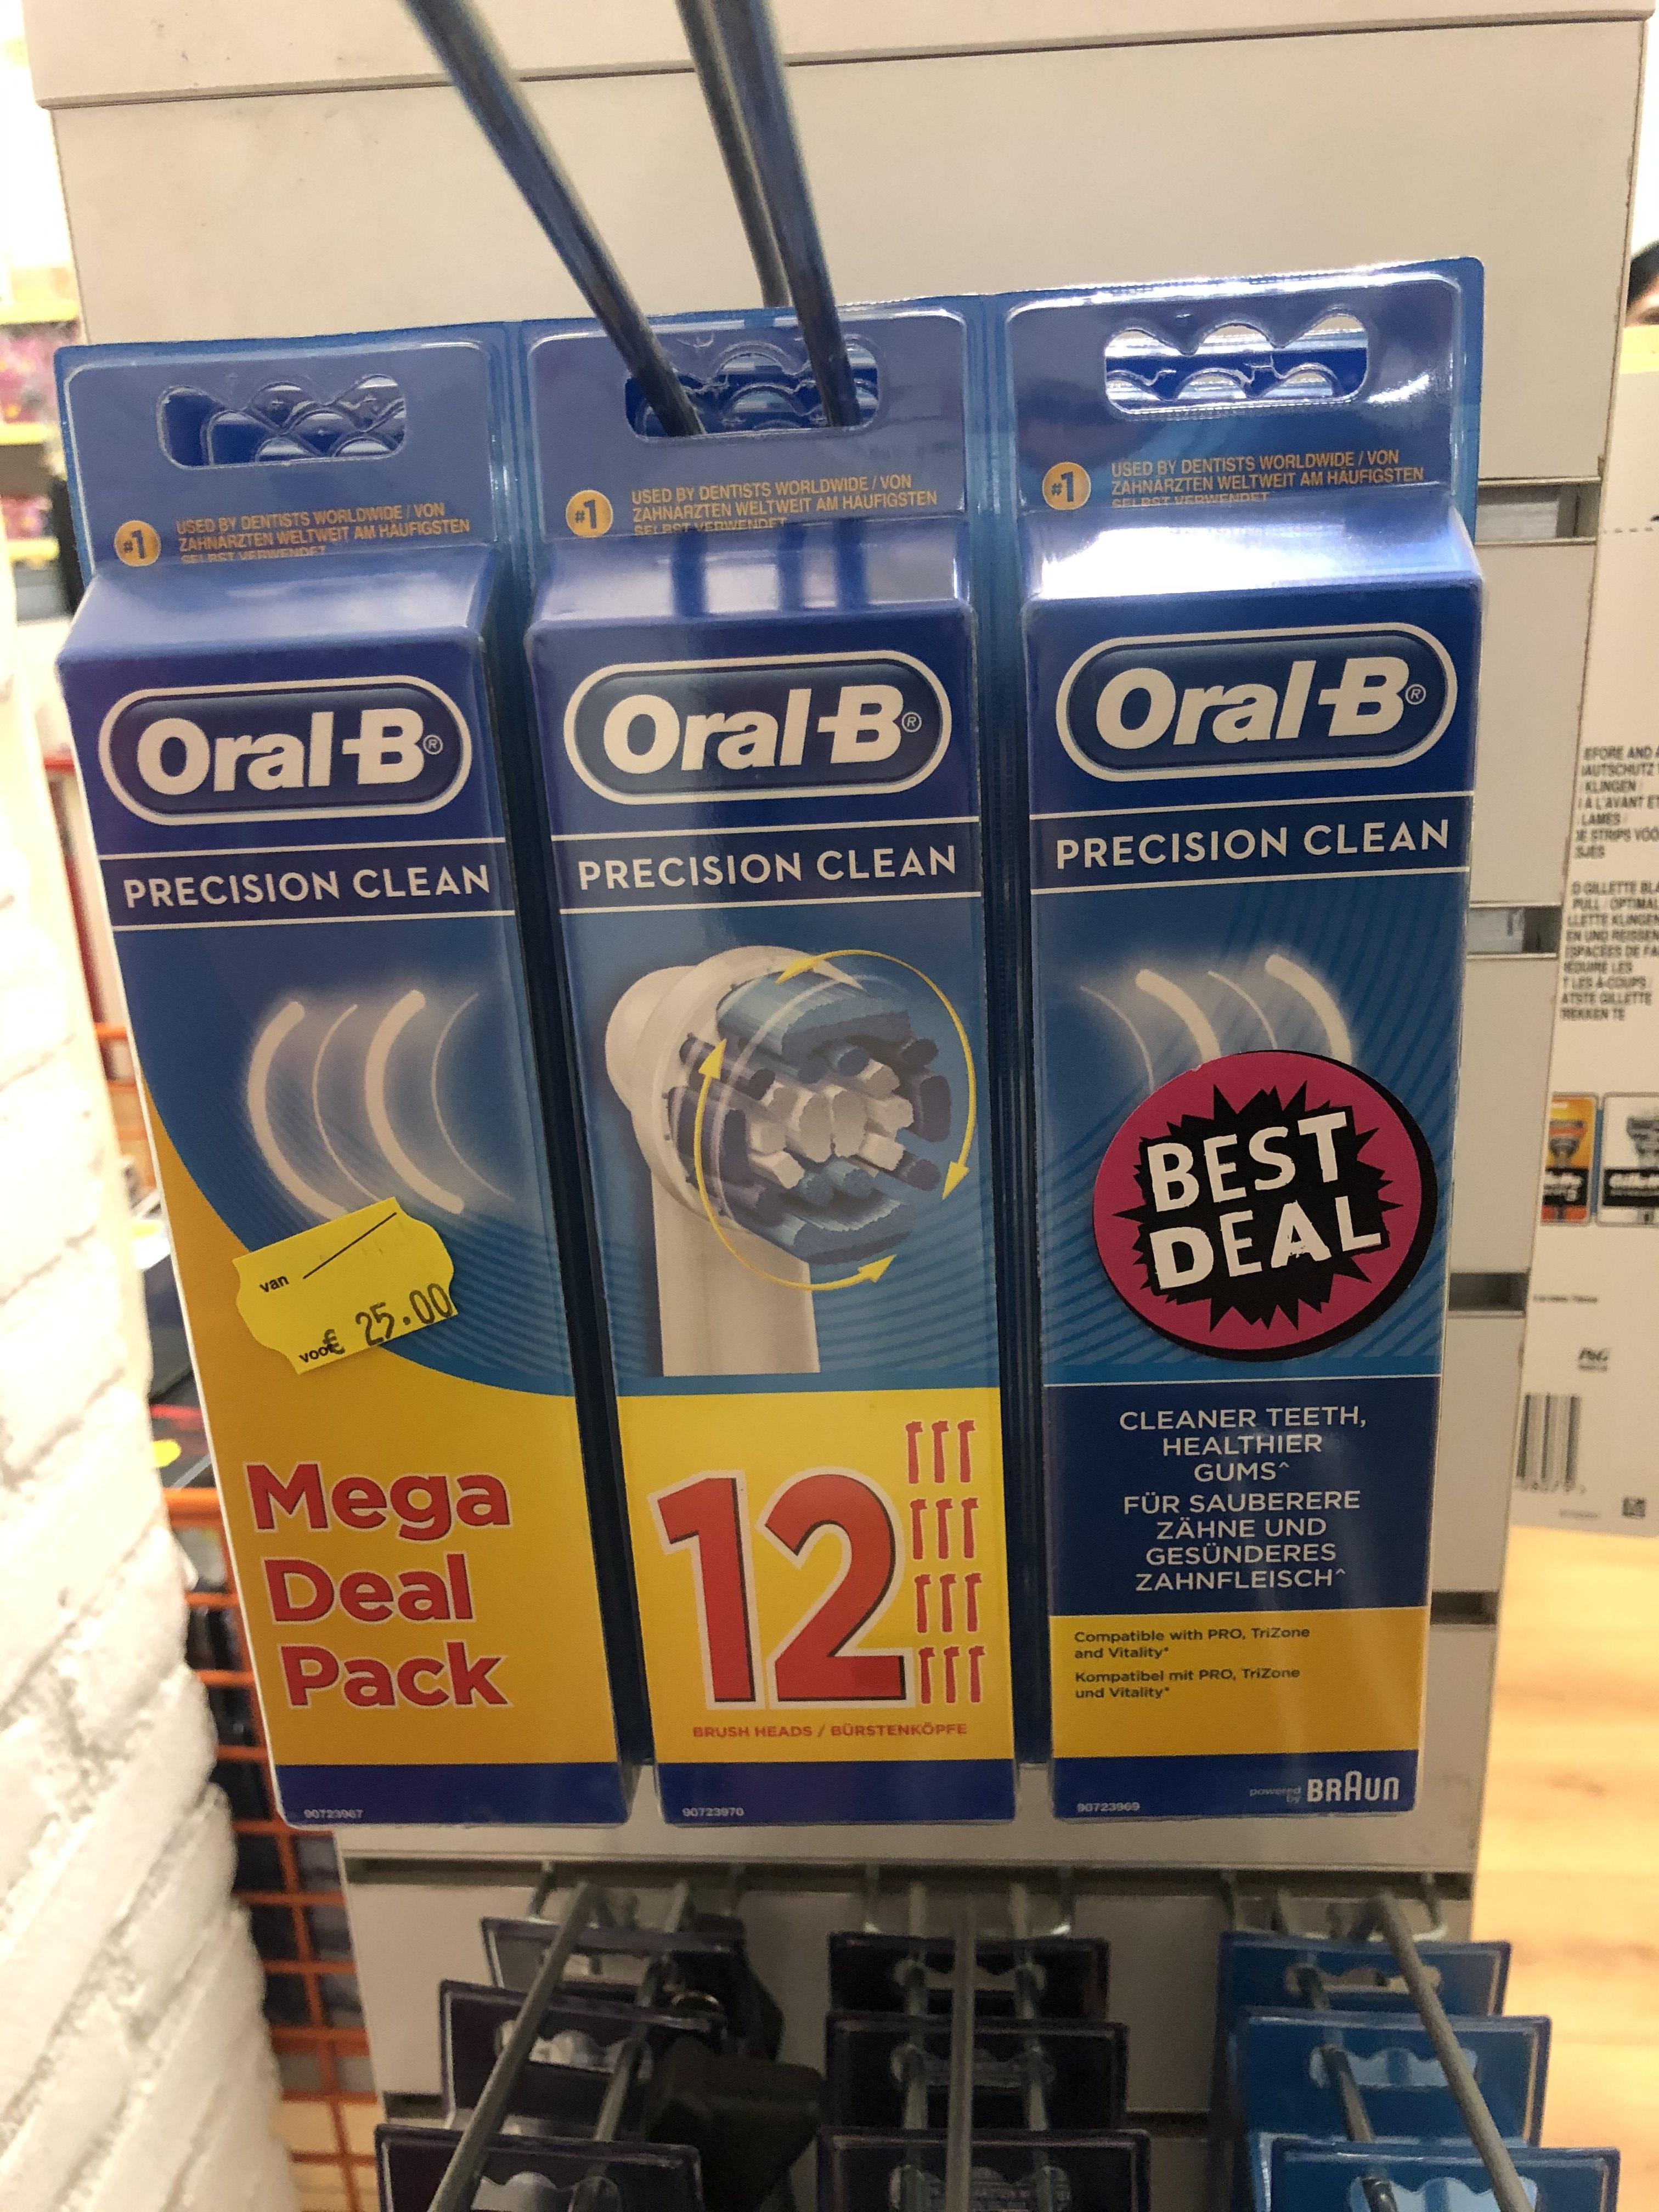 Lokaal! Oral-B Precision clean opzetborstels 12 stuks, 12,50 euro @Prijsmepper Tilburg